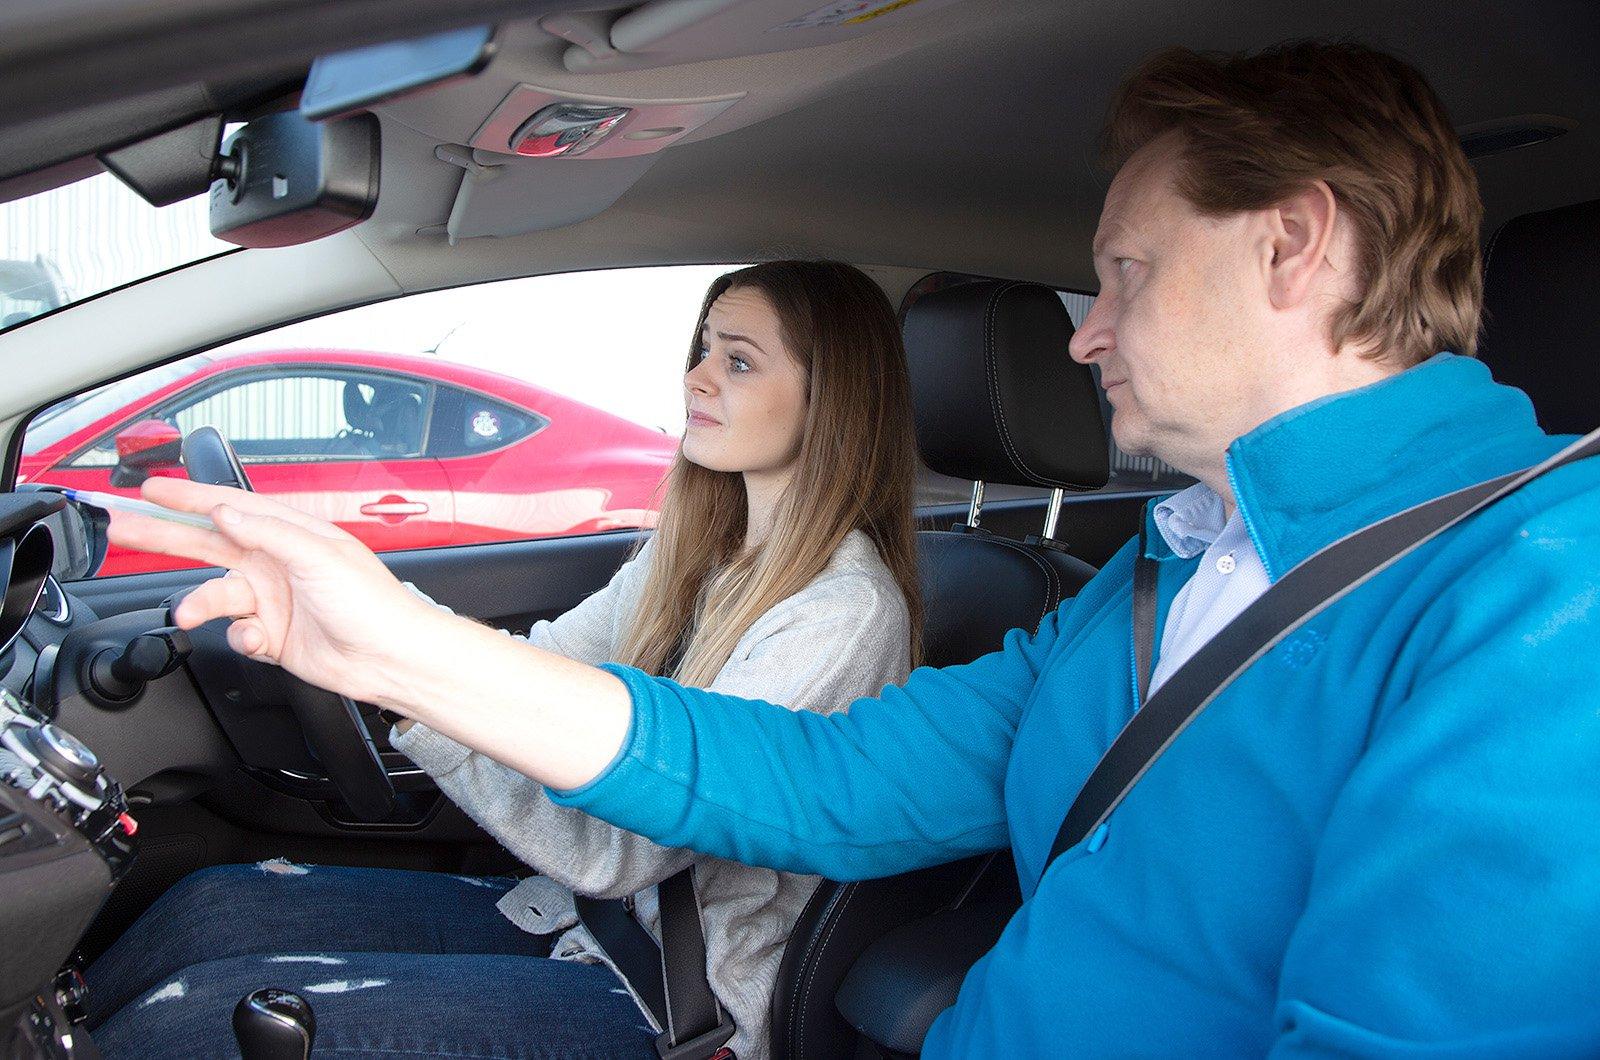 Learner driver looking nervous